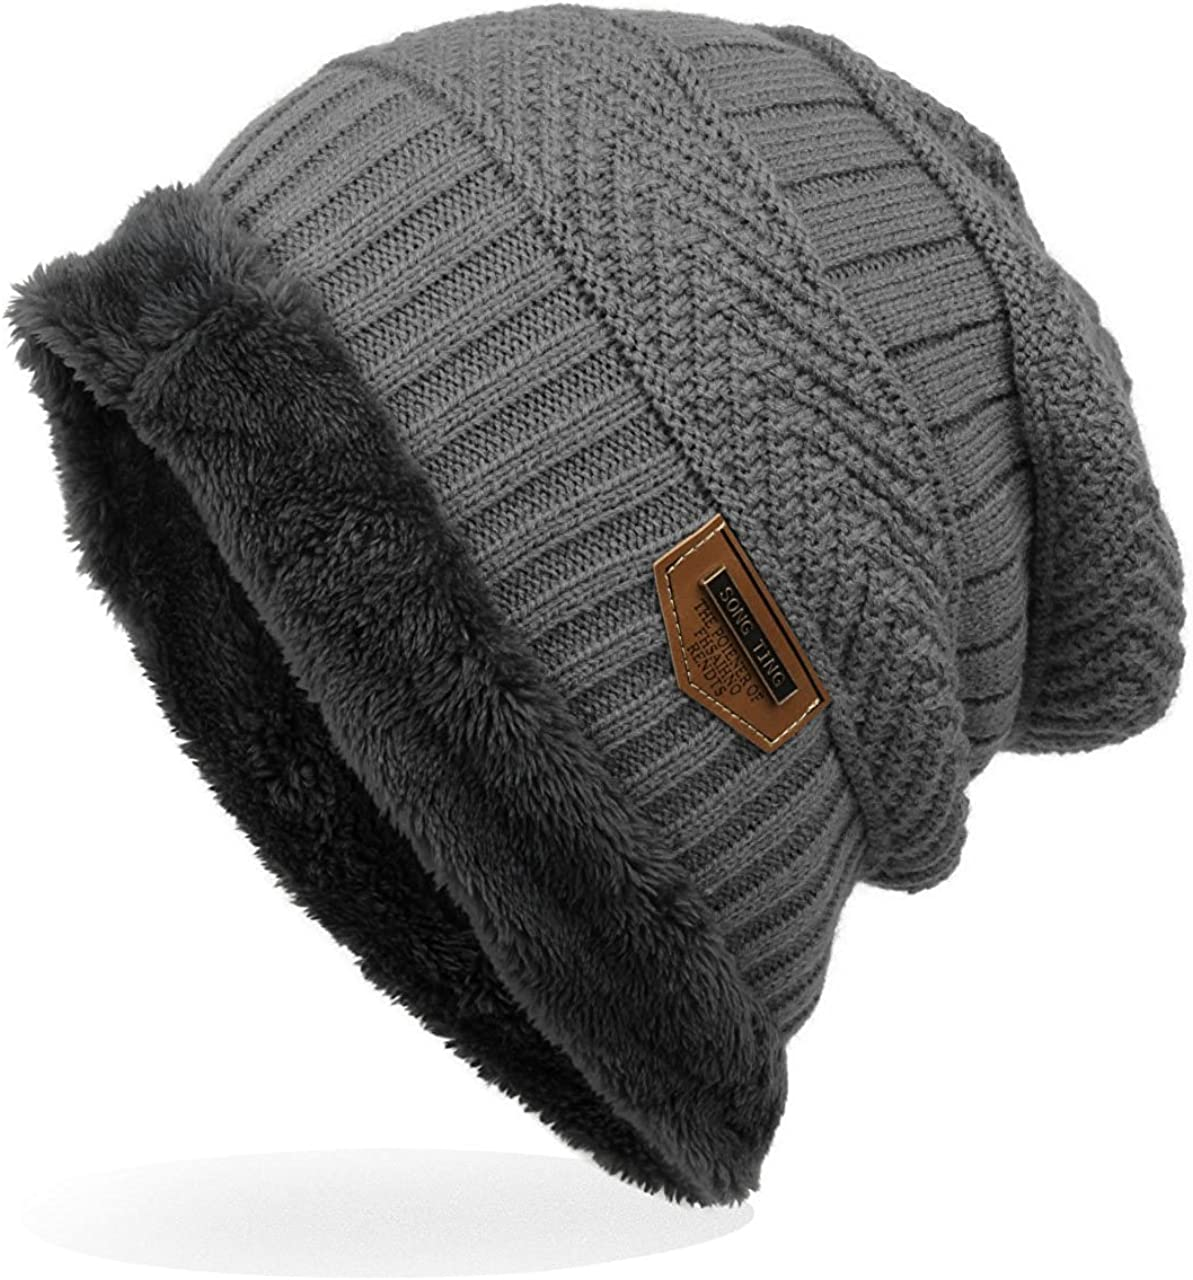 in God We Trust Unisex Warm Winter Hat Knit Beanie Skull Cap Cuff Beanie Hat Winter Hats